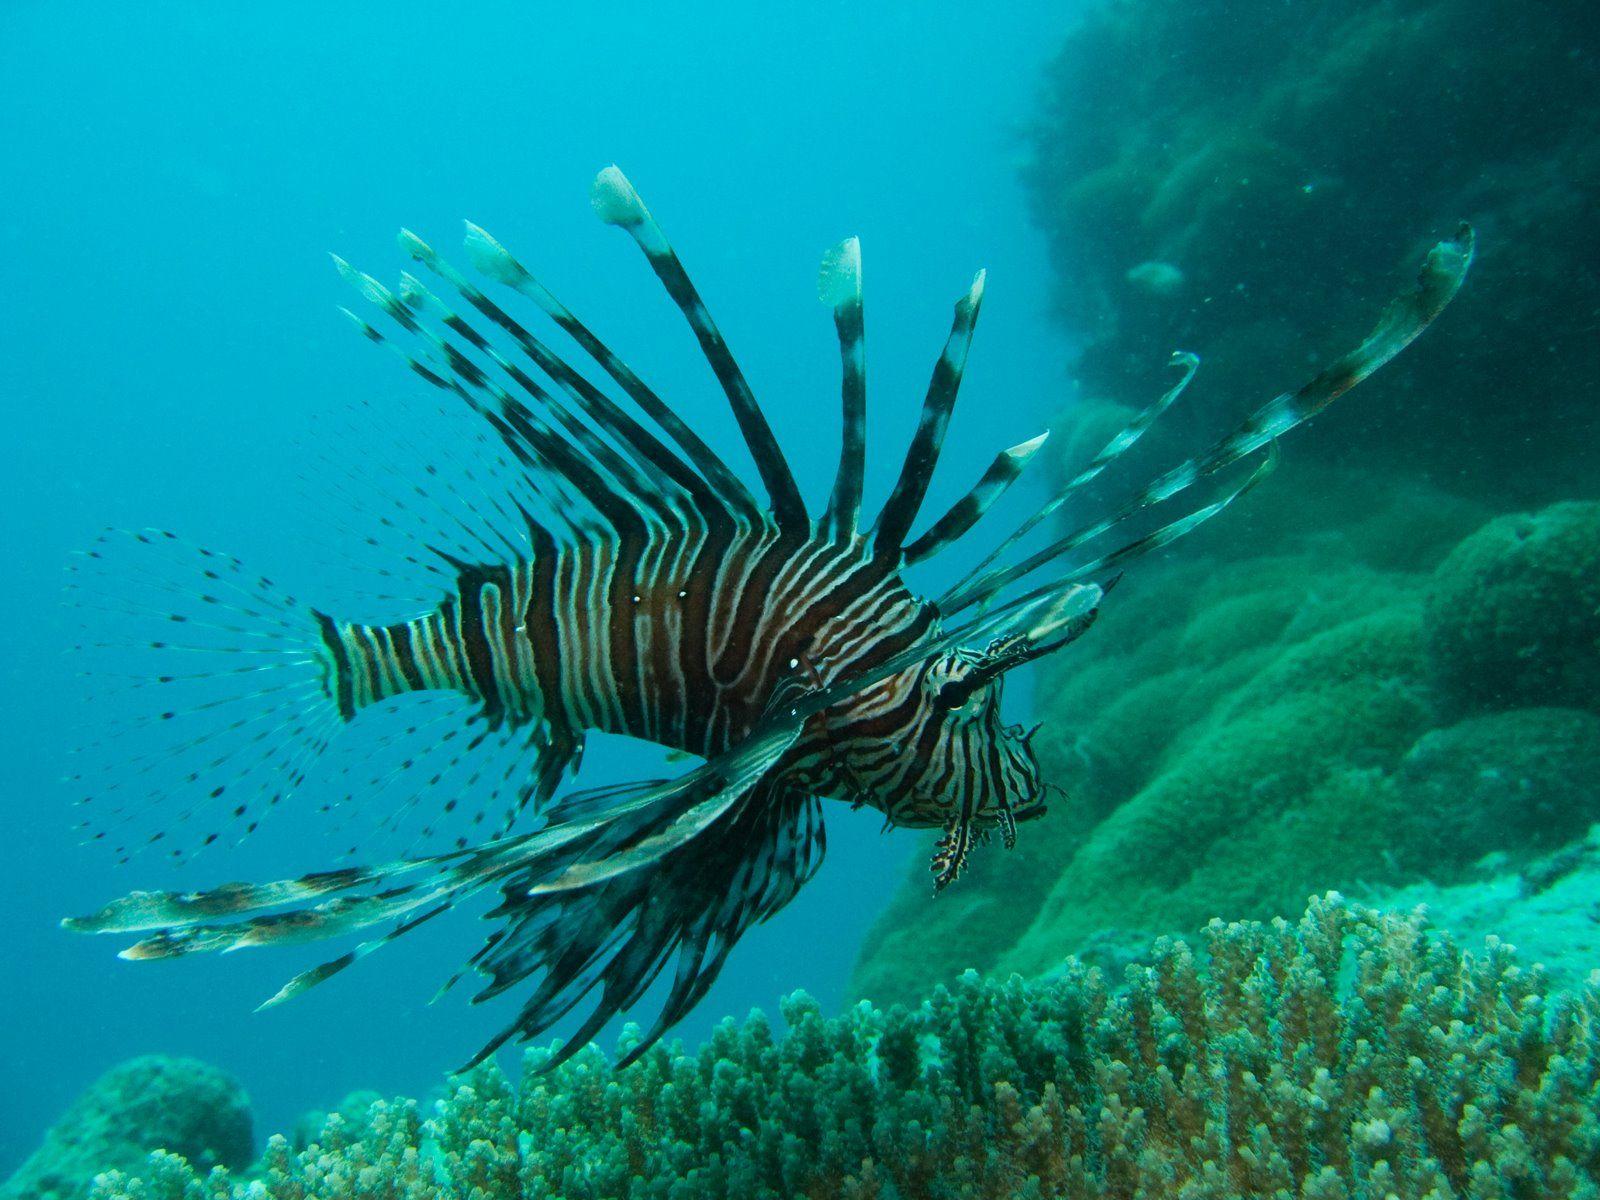 Coral Reef Weird Fish 3